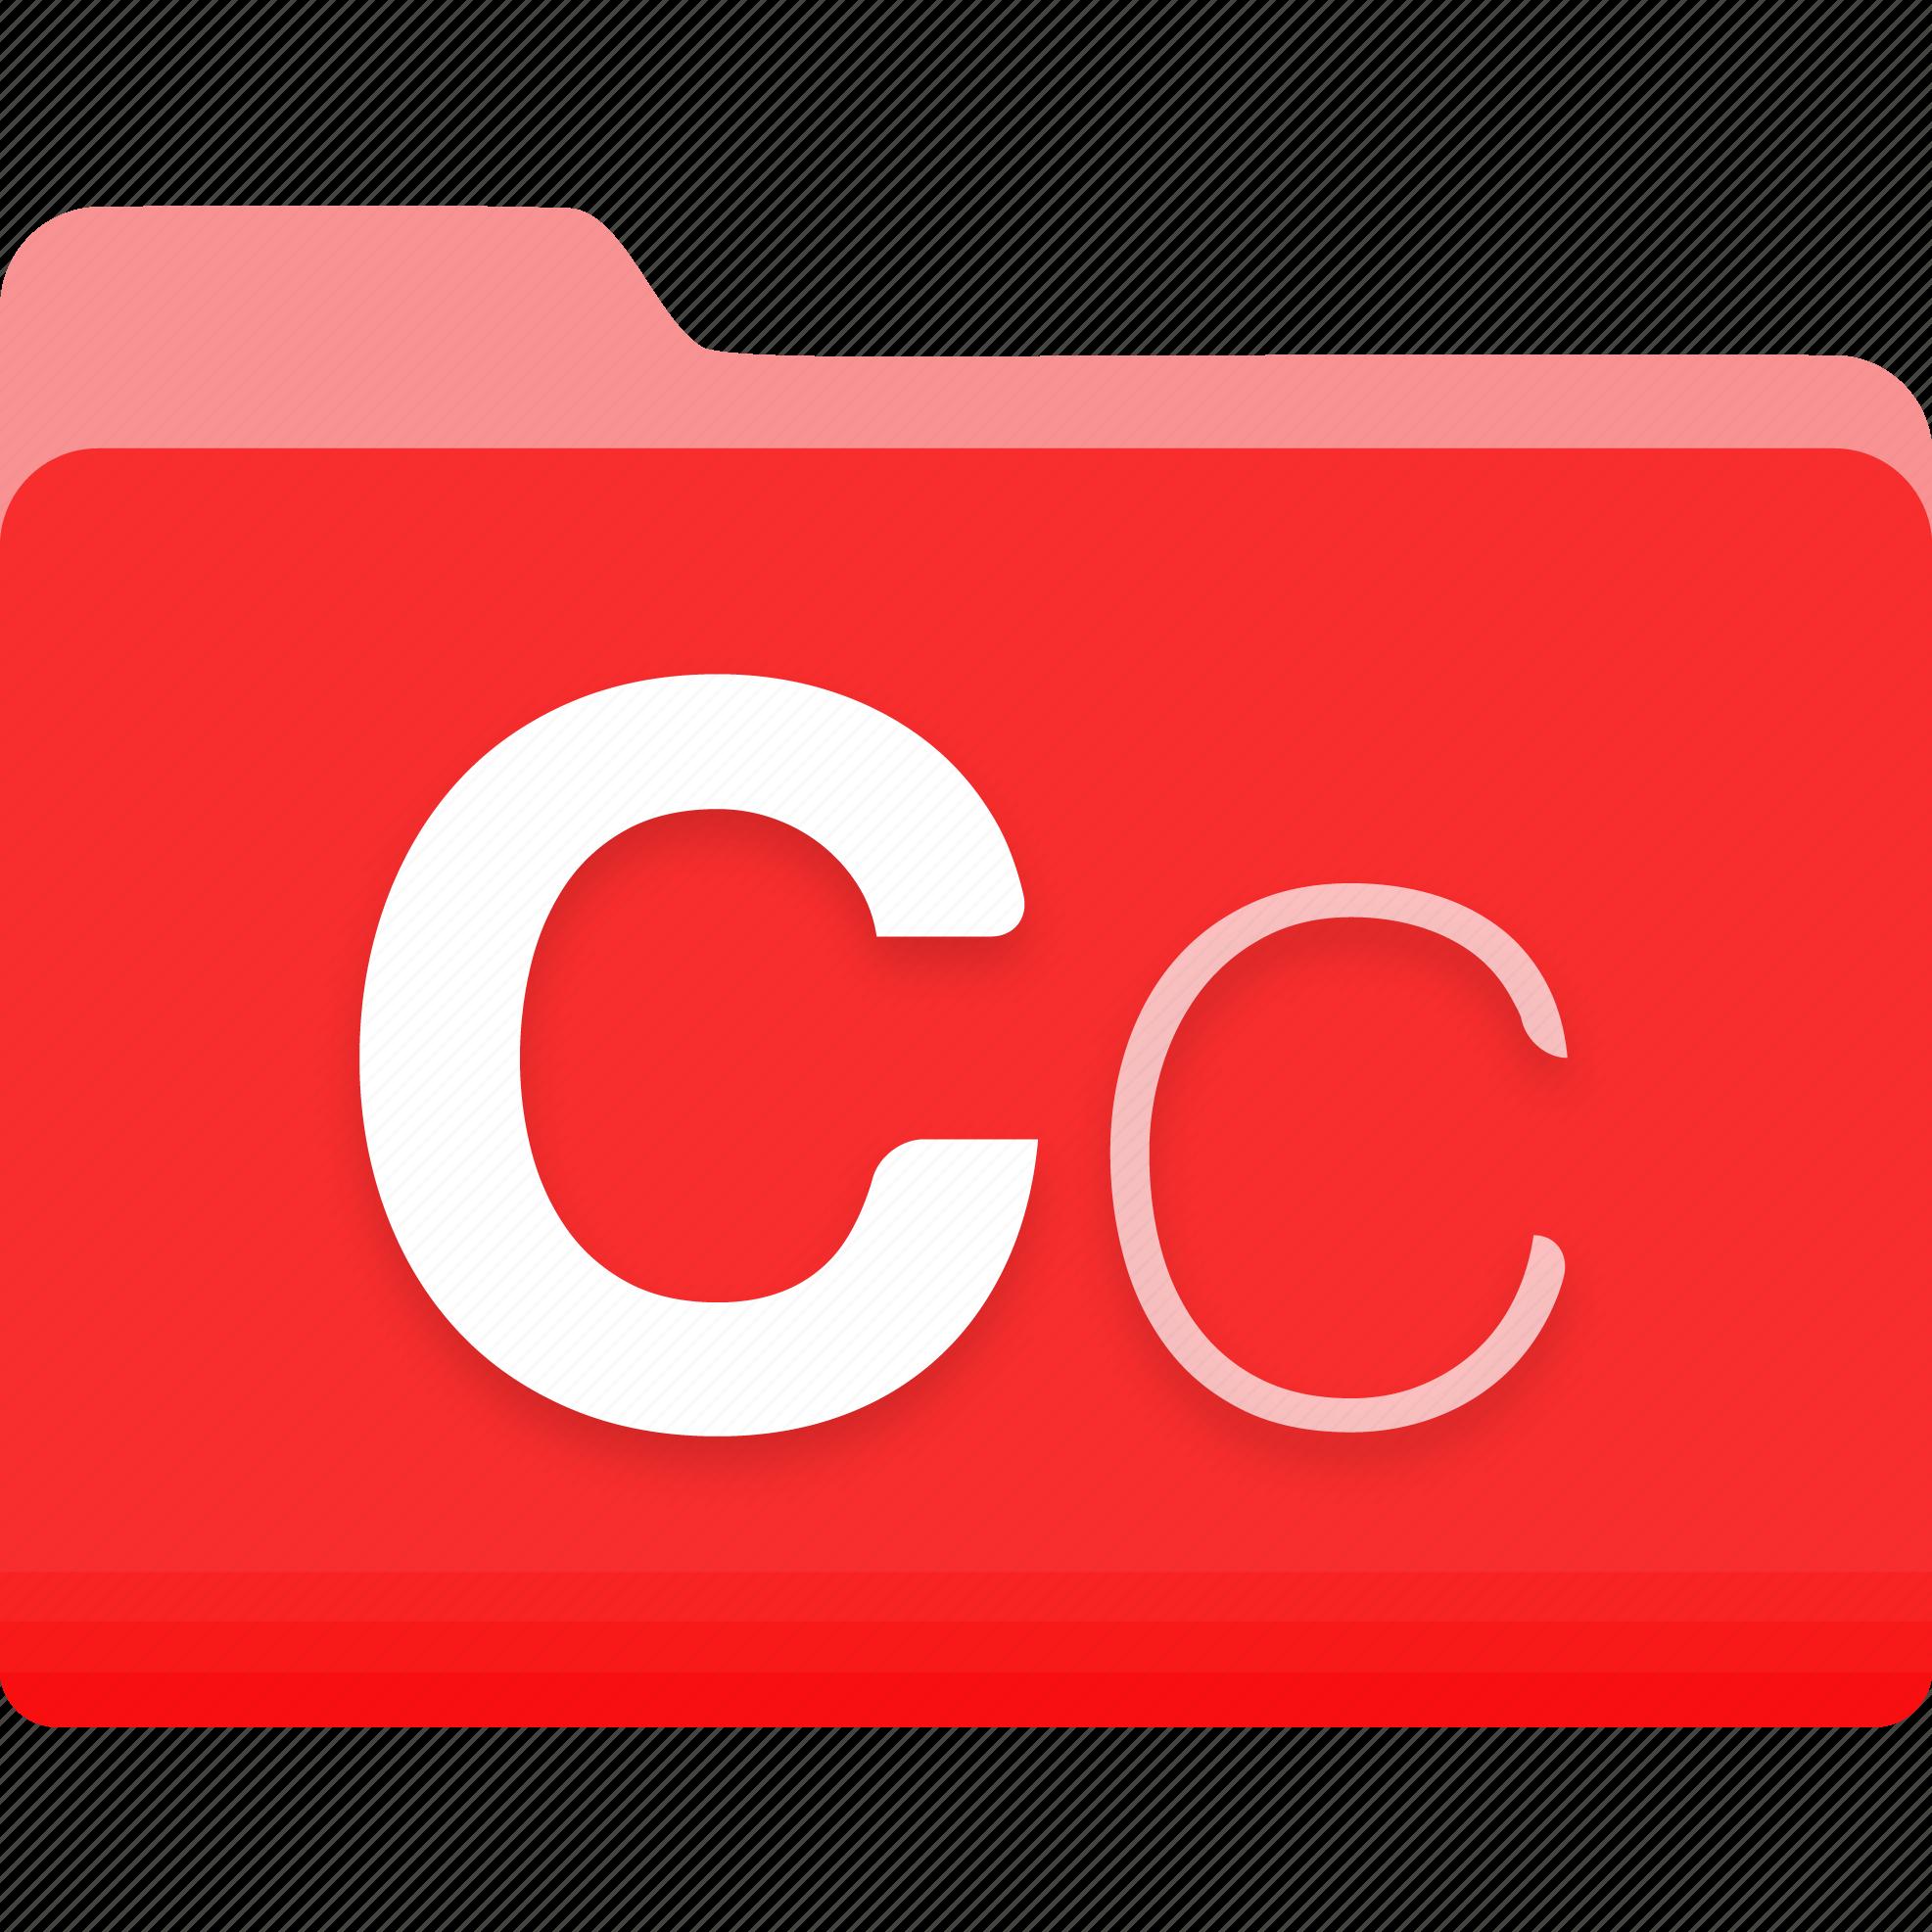 Cloud, creative icon | Icon search engine